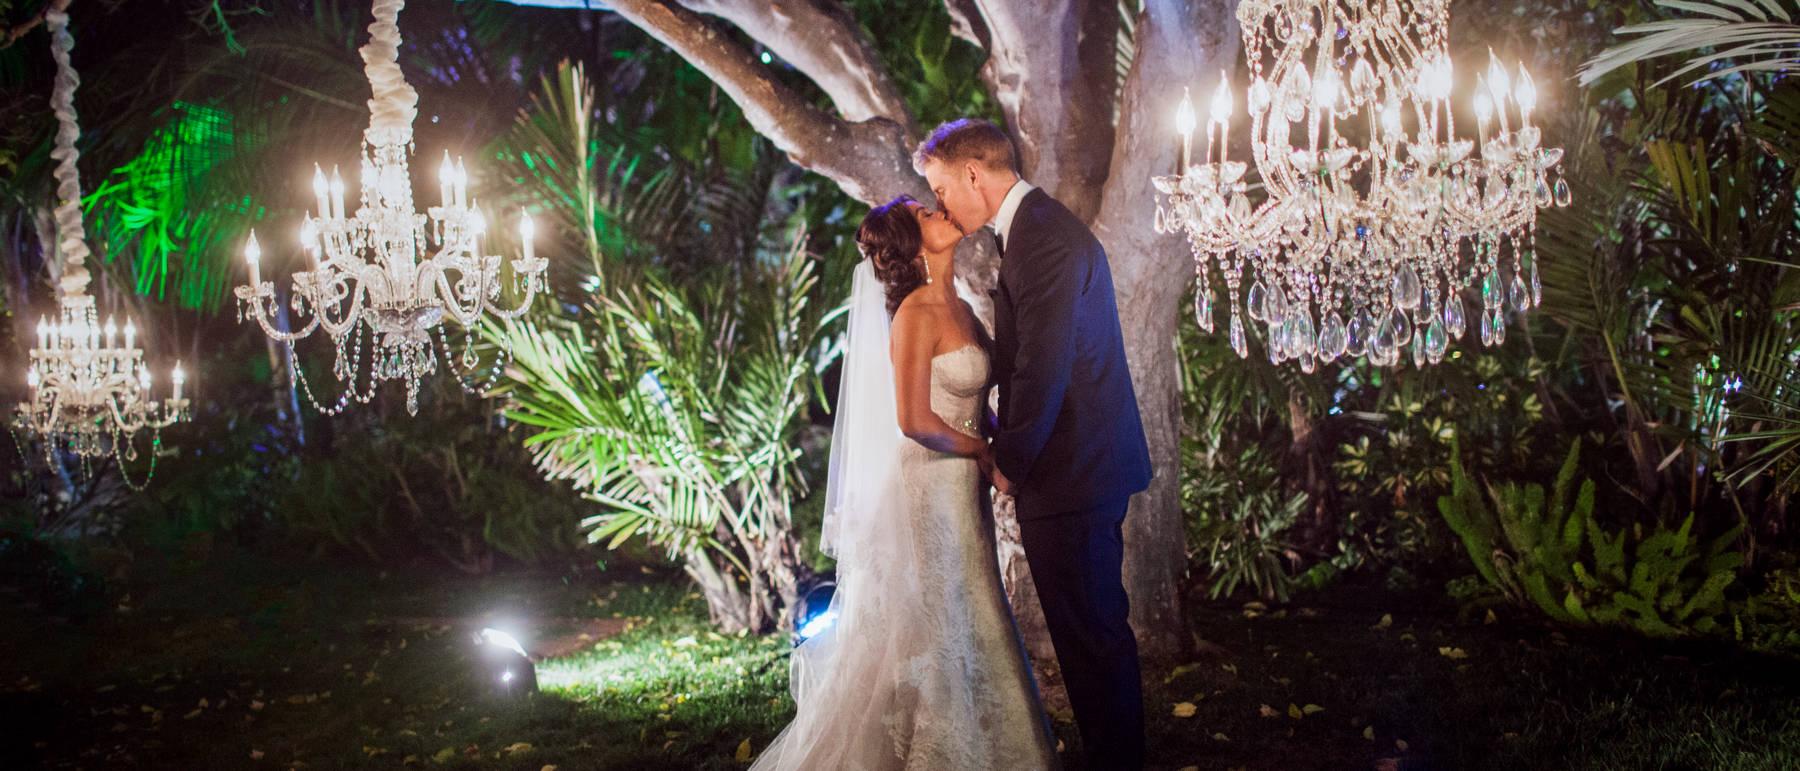 johnandjoseph-wedding-photographer-hz-slider-354